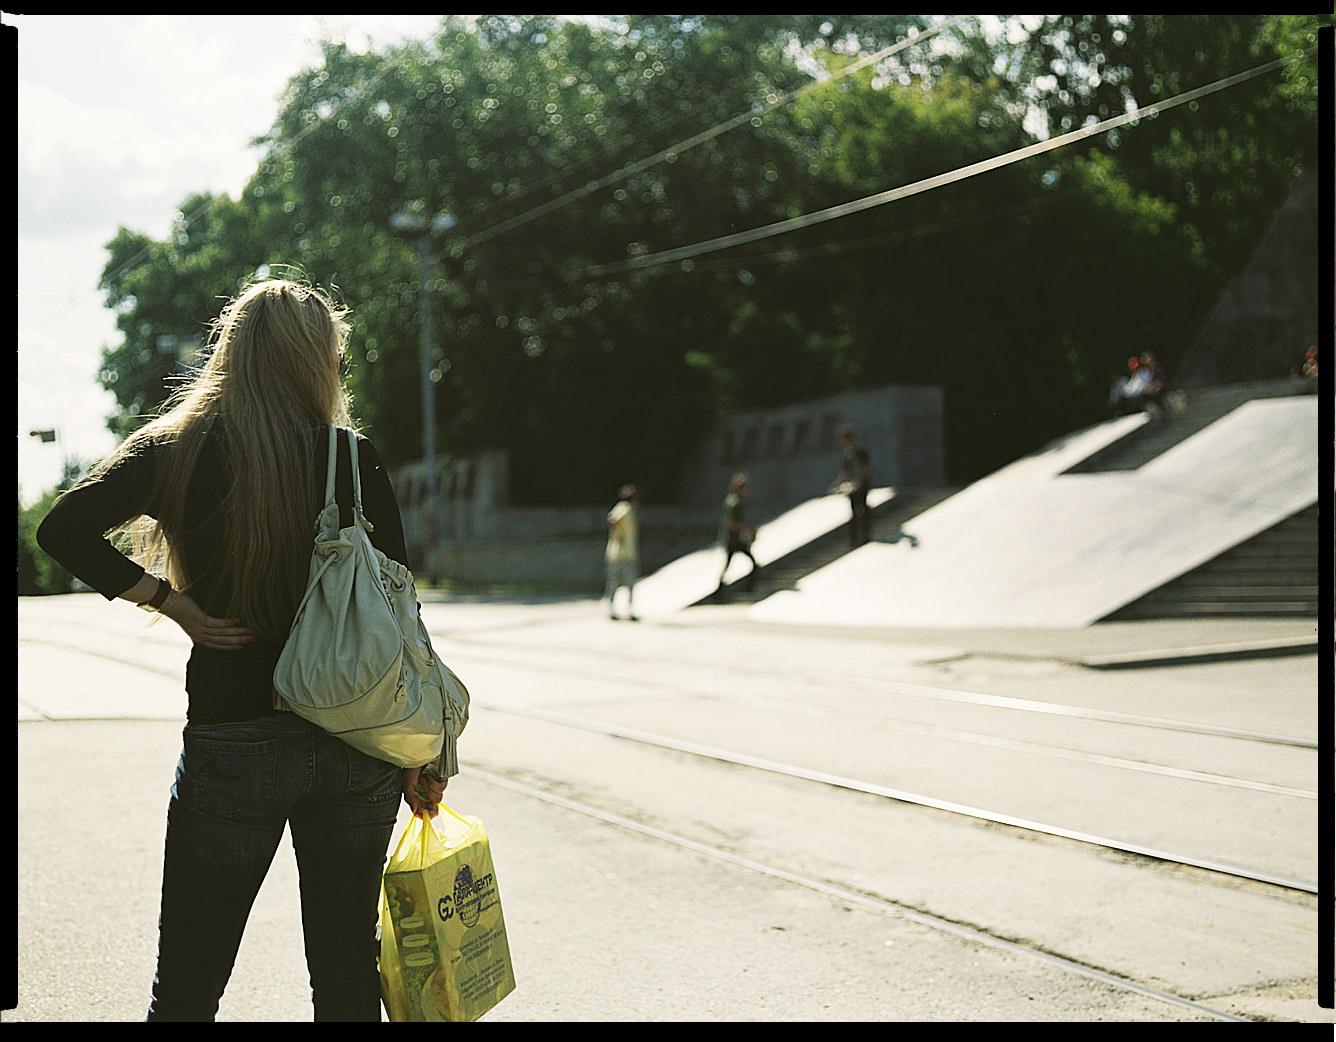 MediumFormatPatrikWallner_Yekaterinburg_LookingAtDoubleBankLOWQ